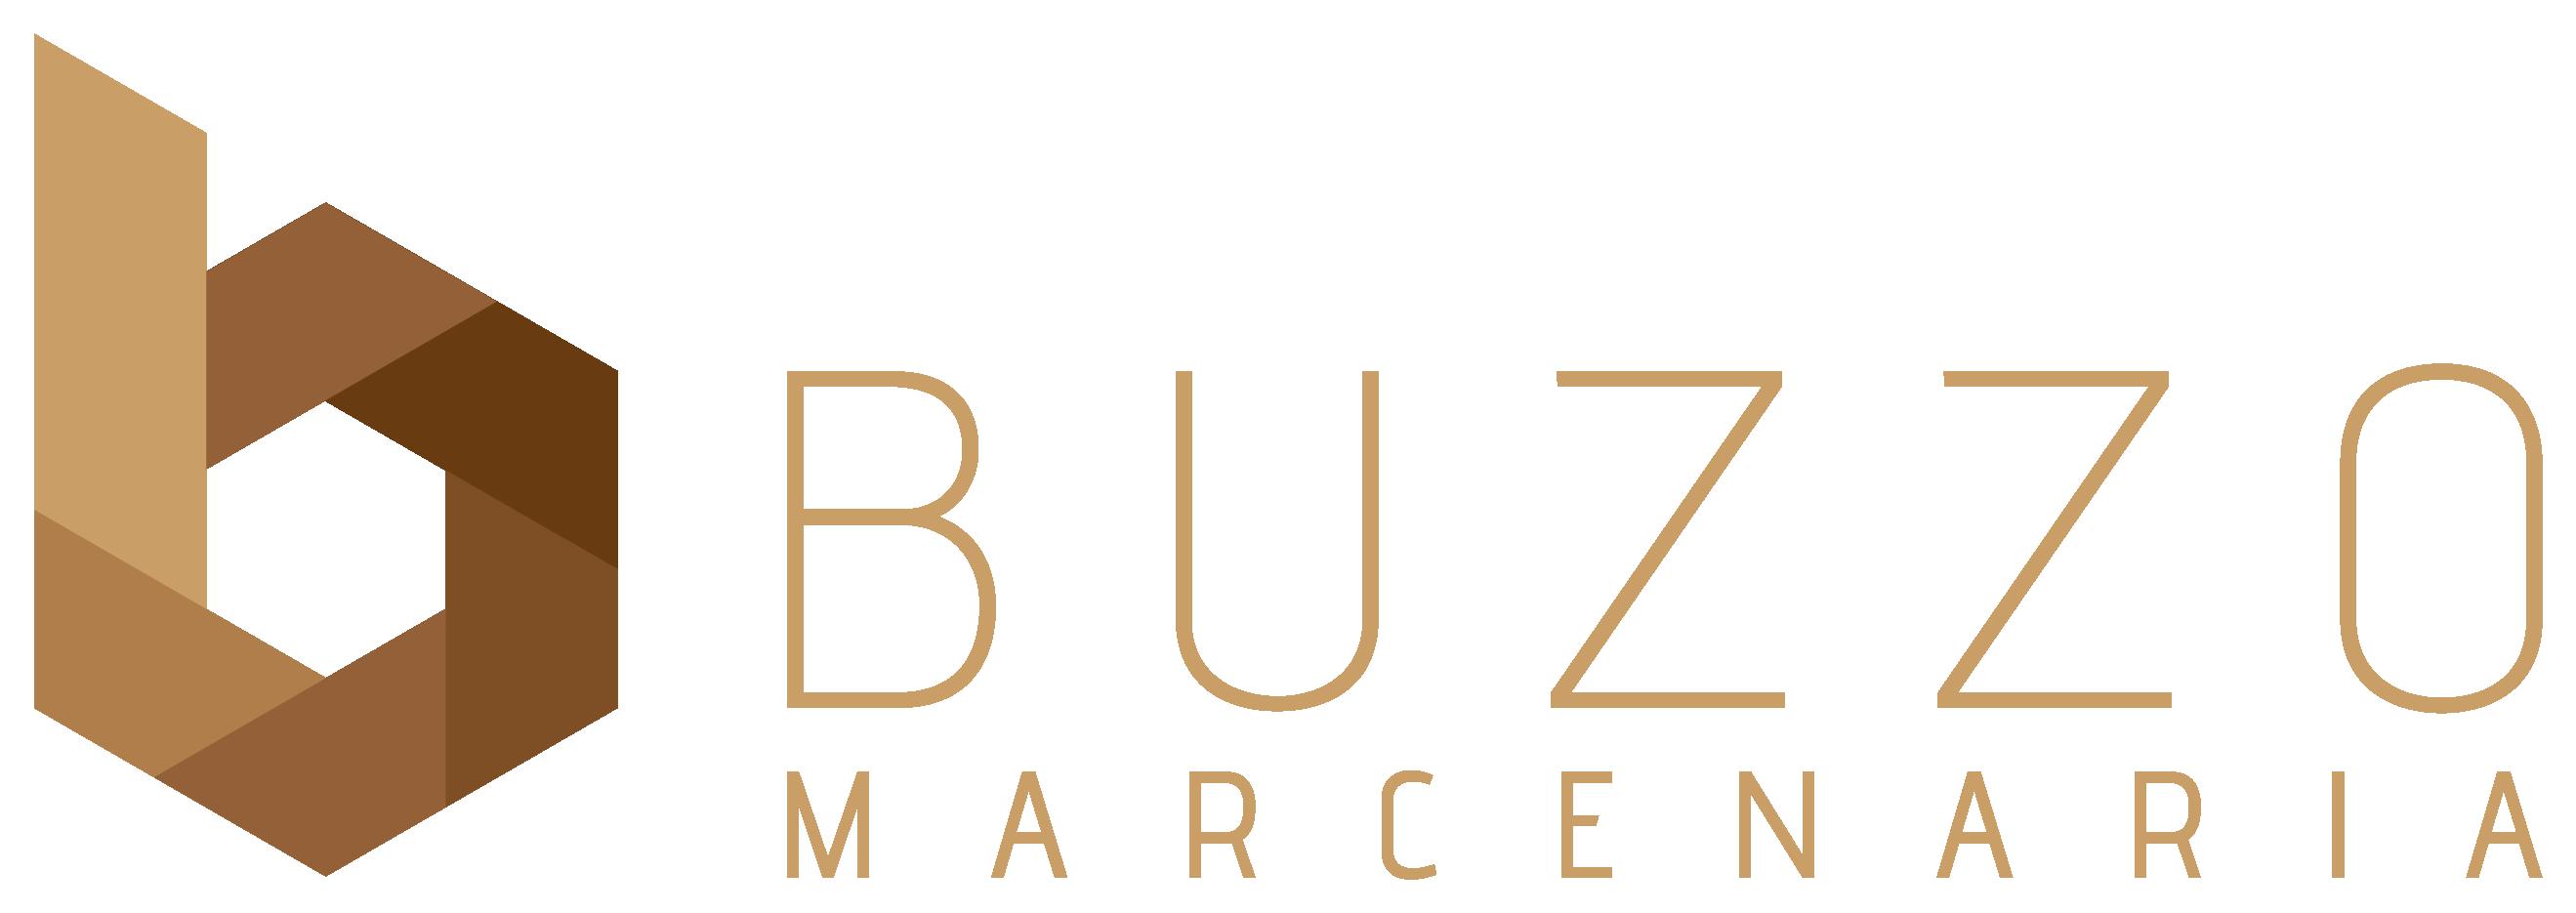 Buzzo Marcenaria